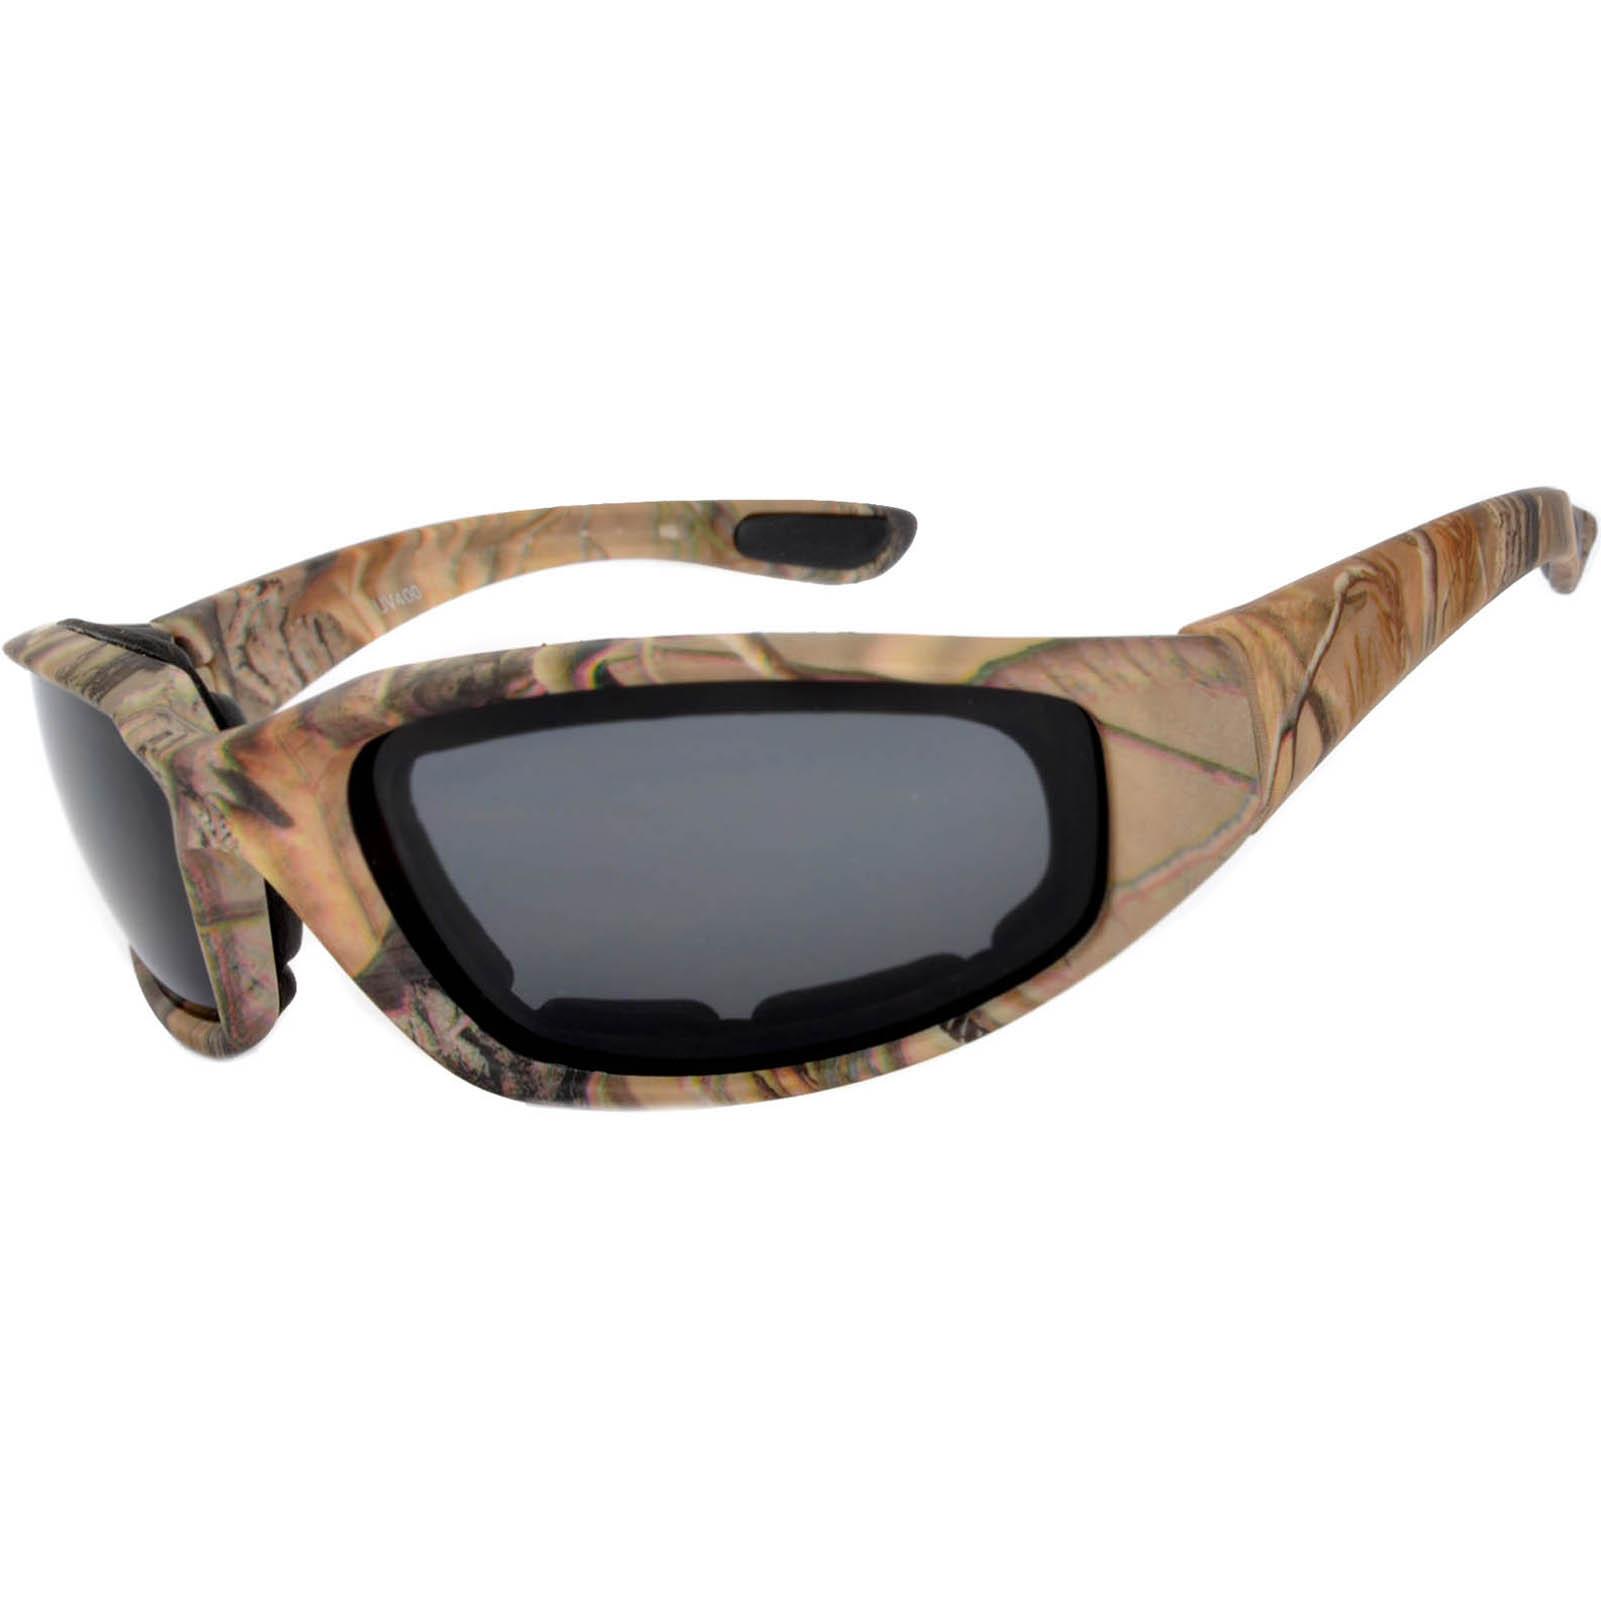 OWL Eyewear Motorcycle Padded Glasses Camo#3 Frame Smoke Lens (One ...